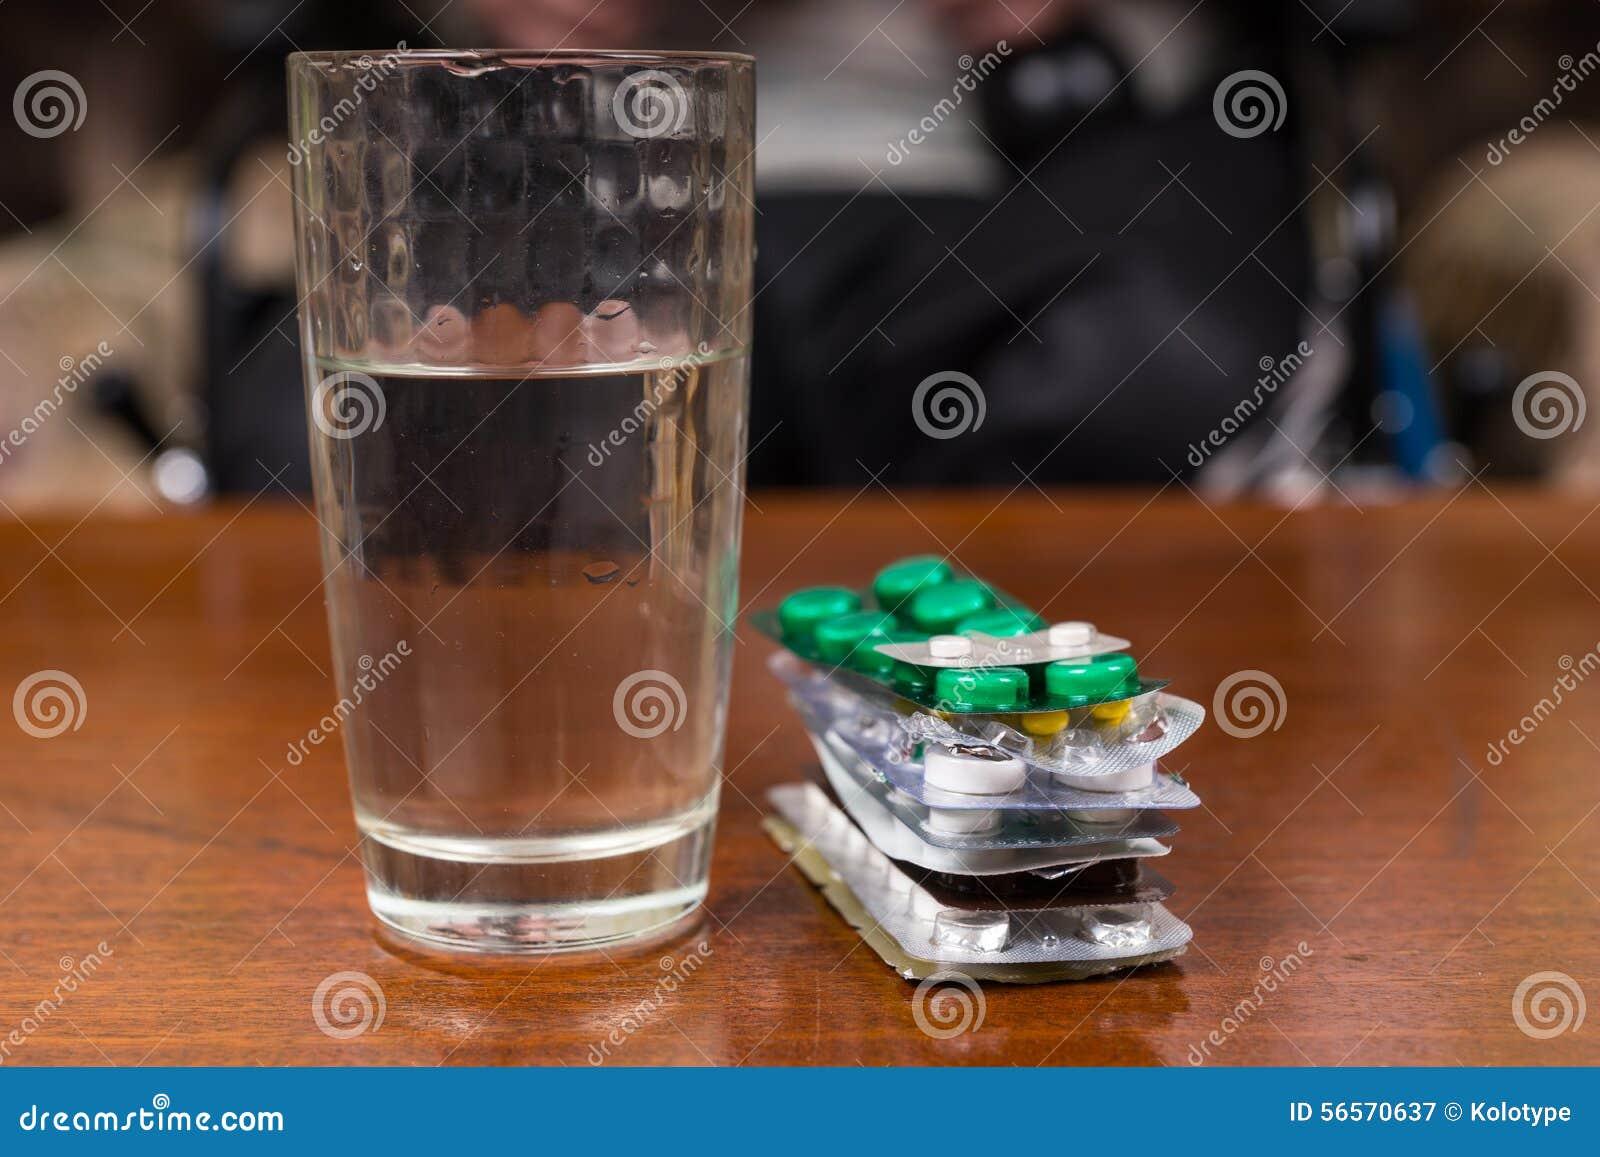 Download Ποτήρι του νερού στον πίνακα εκτός από το σωρό των χαπιών Στοκ Εικόνα - εικόνα από σωρός, γυαλί: 56570637